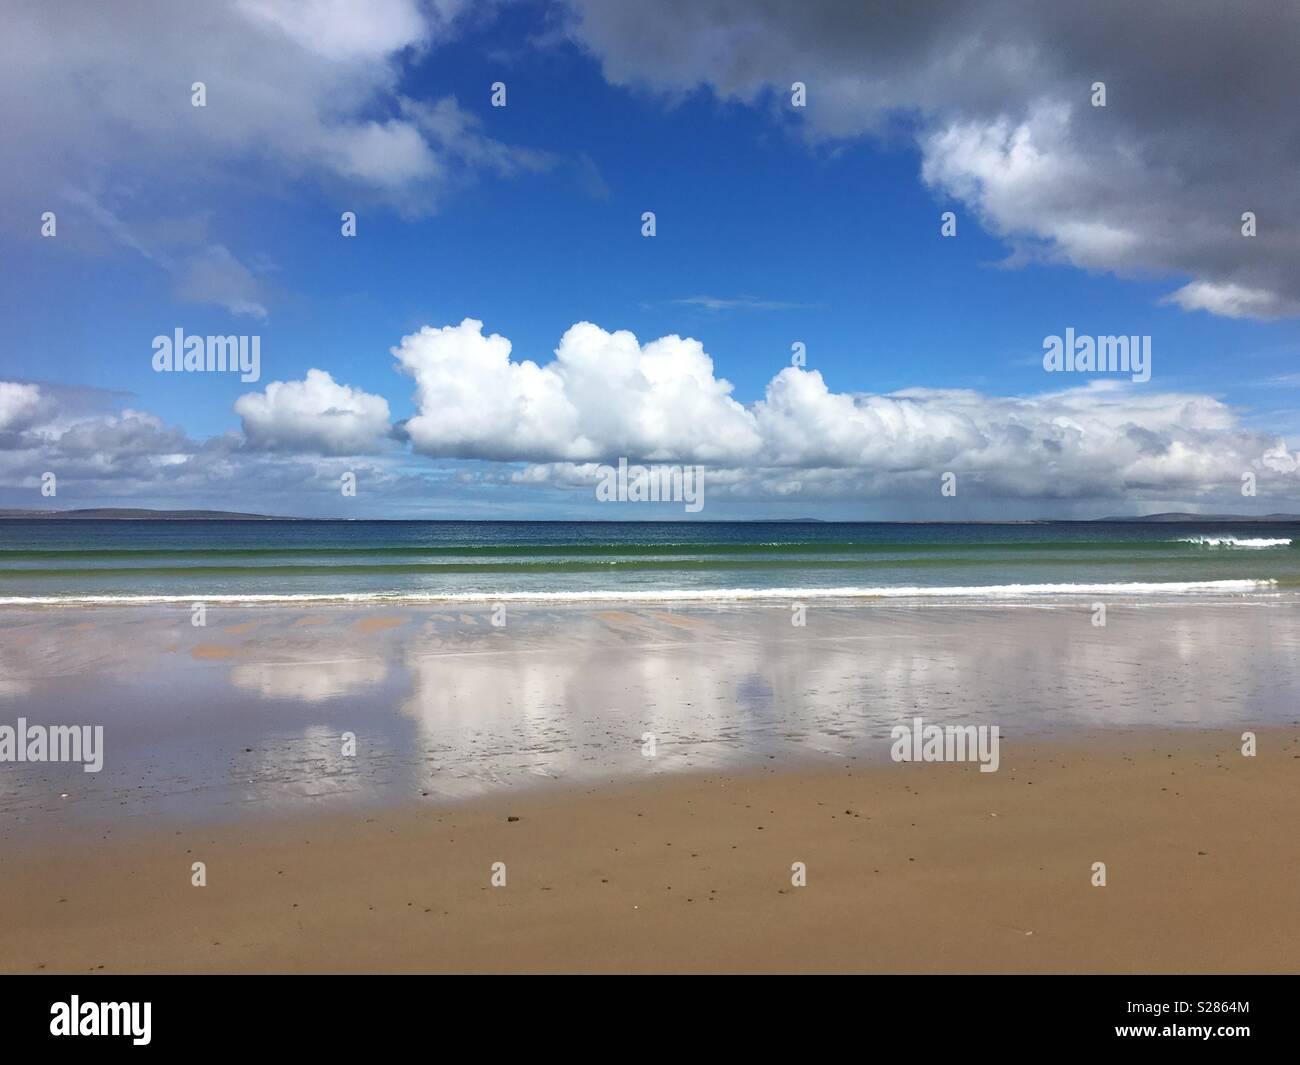 Beach, sea, blue sky and clouds on Achill Island, County Mayo, Ireland - Stock Image